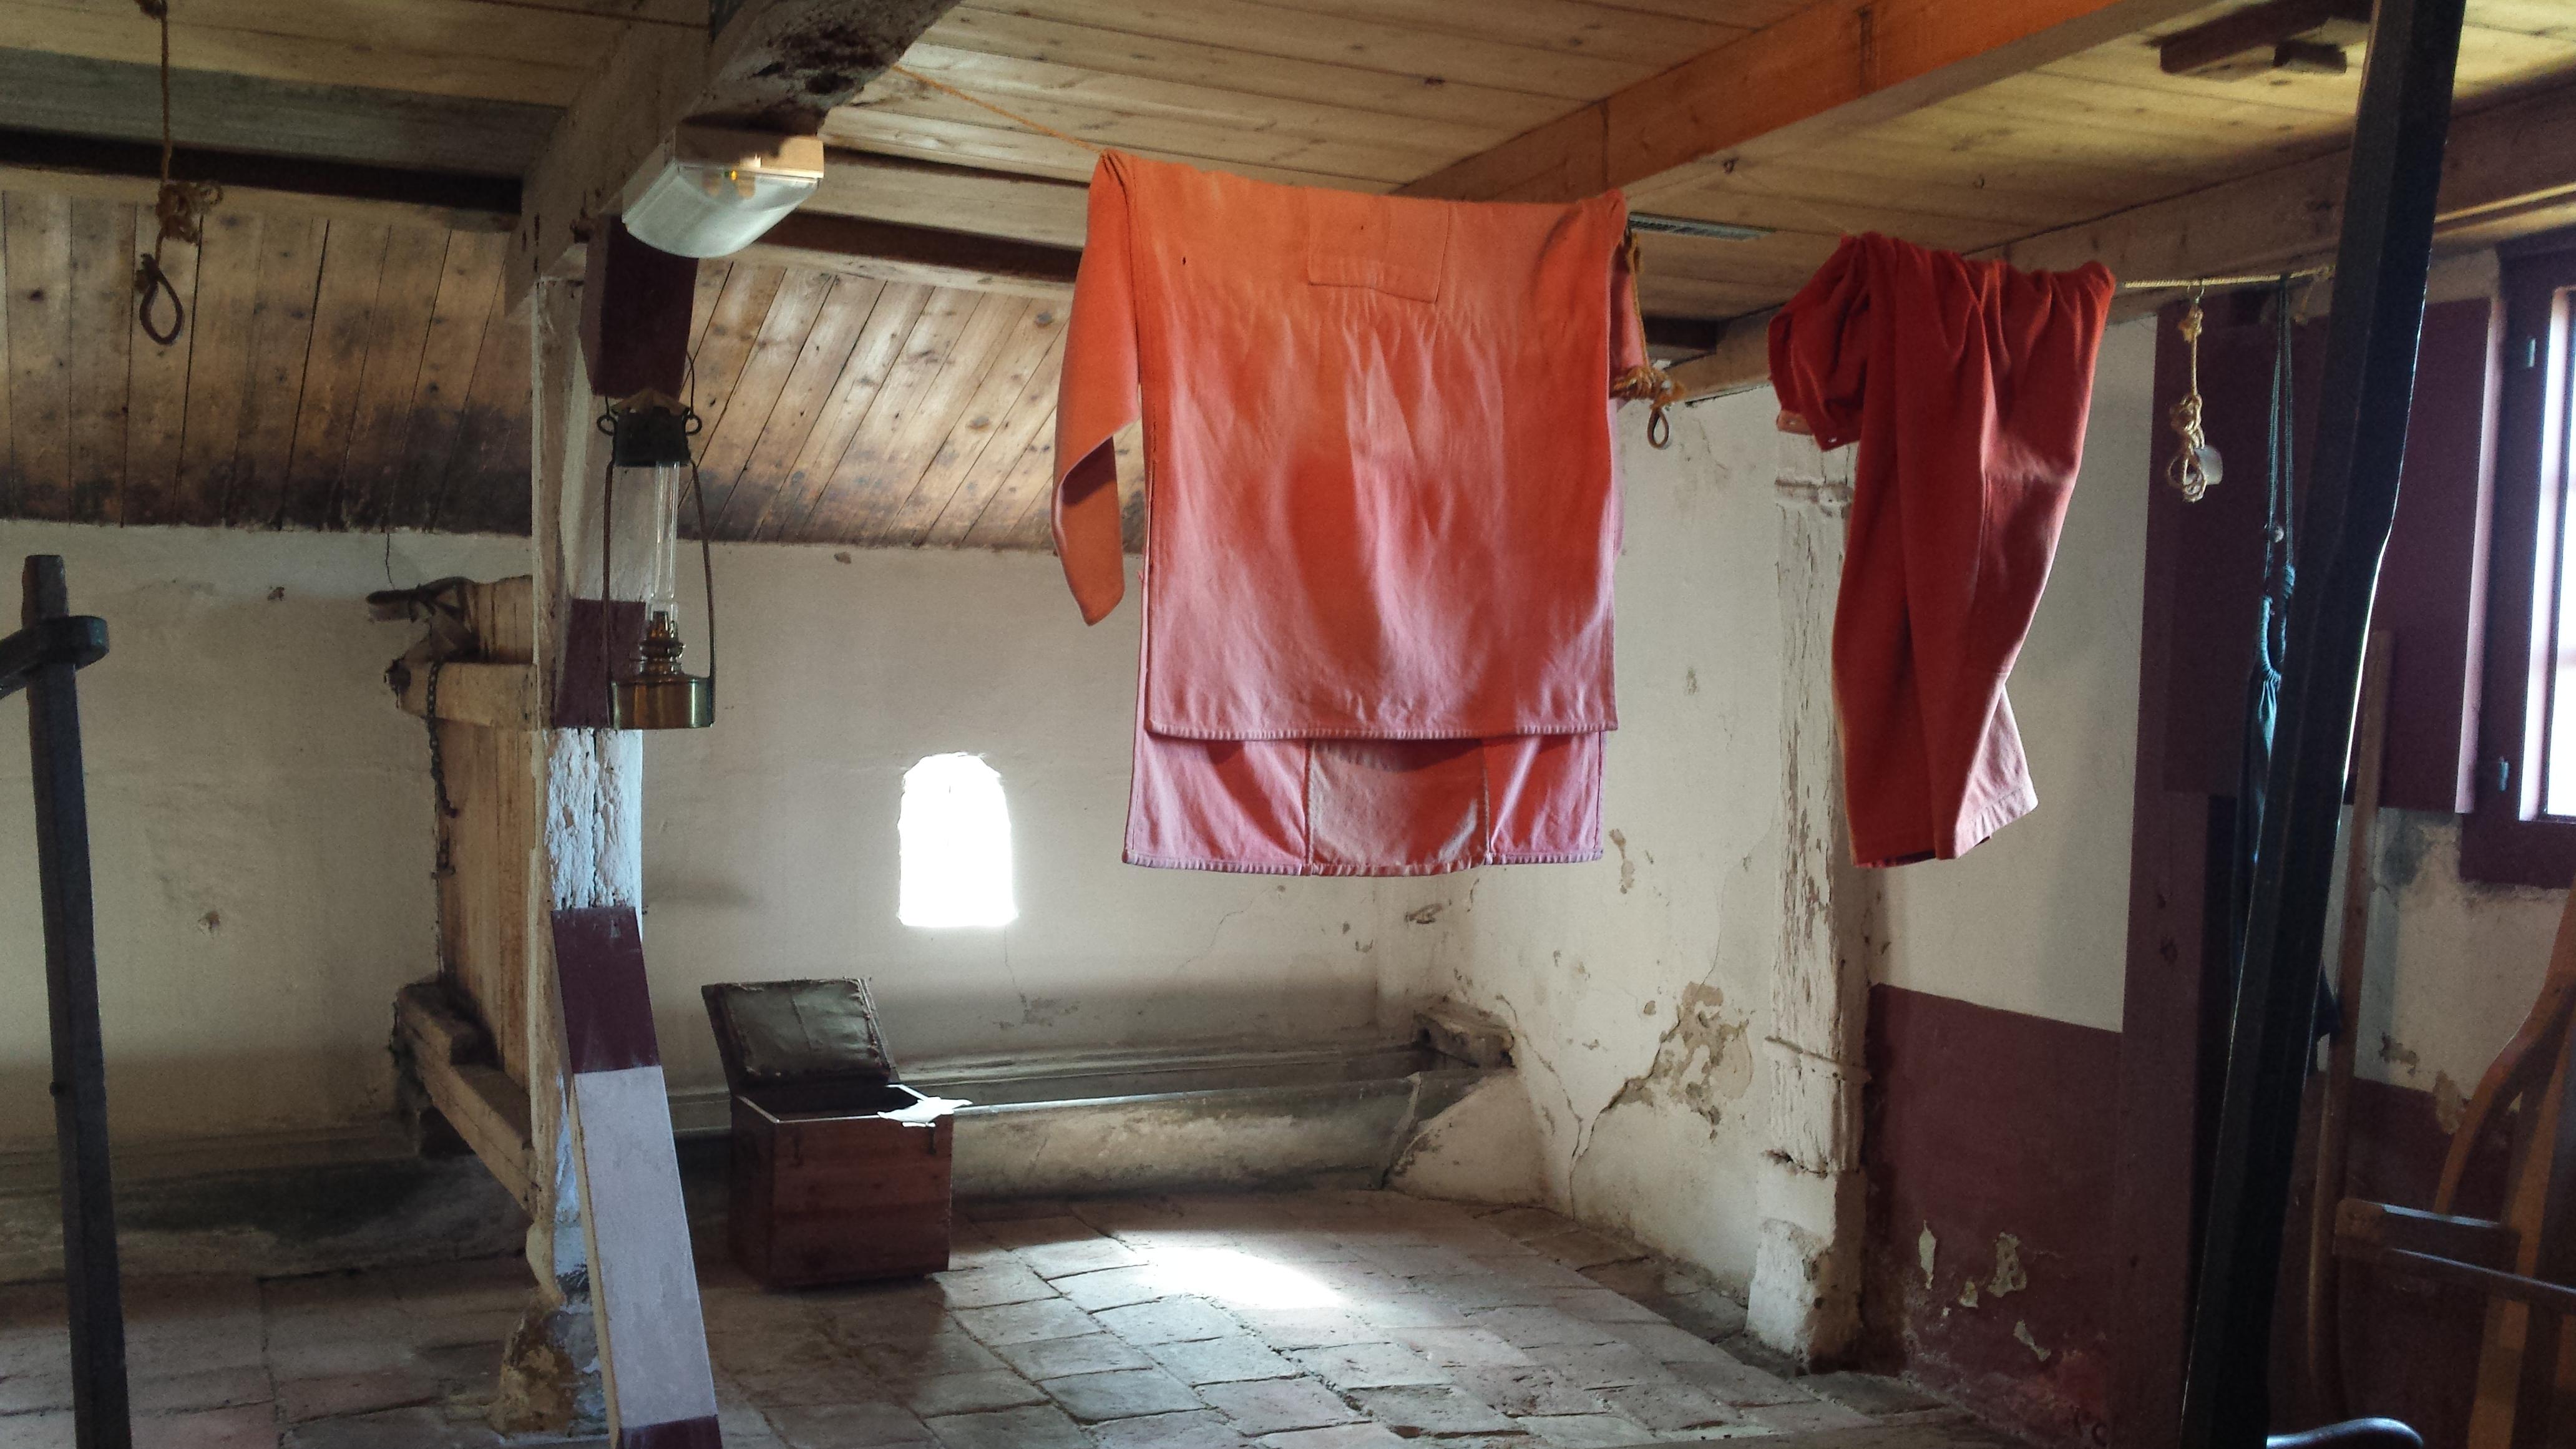 Museumconcept, ondernemingsplan en bidbook voor Het Friese Museumdorp. Stichting Aldfaers Erf